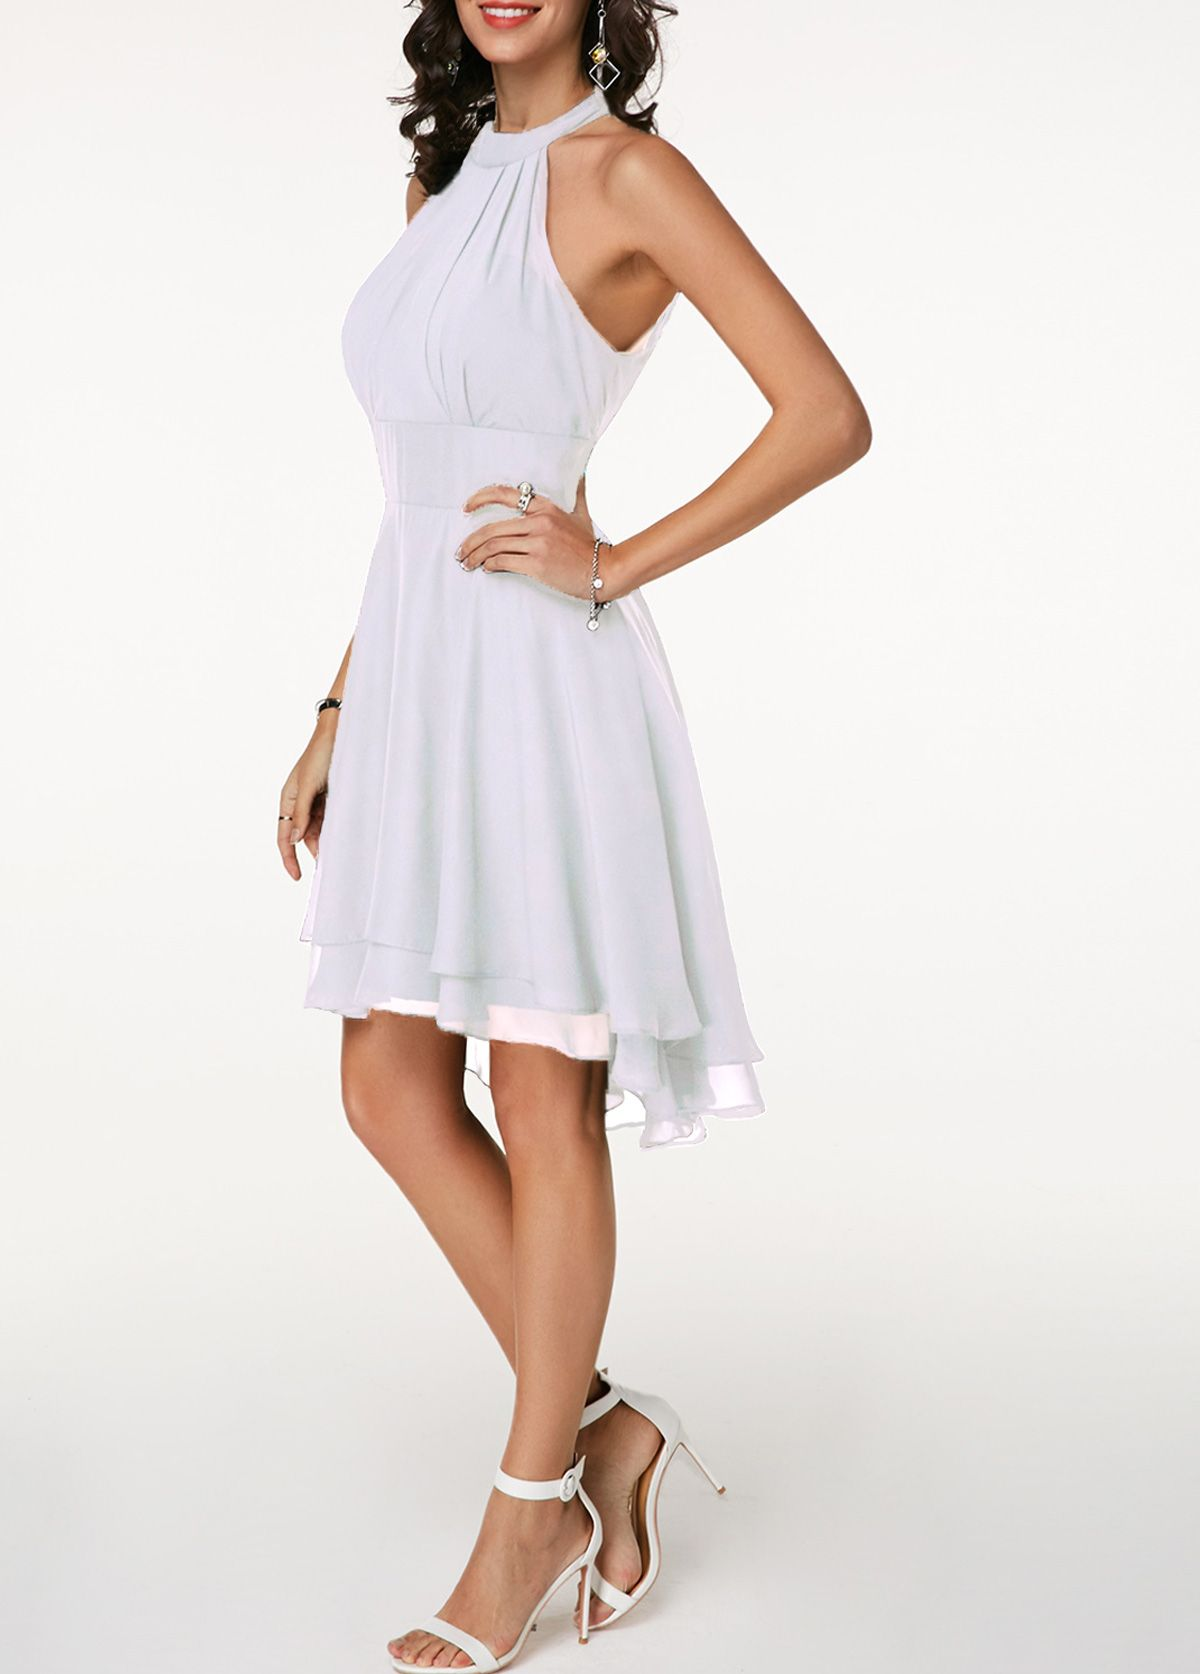 0c497f7f17f815 High Waist Sleeveless Asymmetric Hem White Dress | Rotita.com - USD $31.65